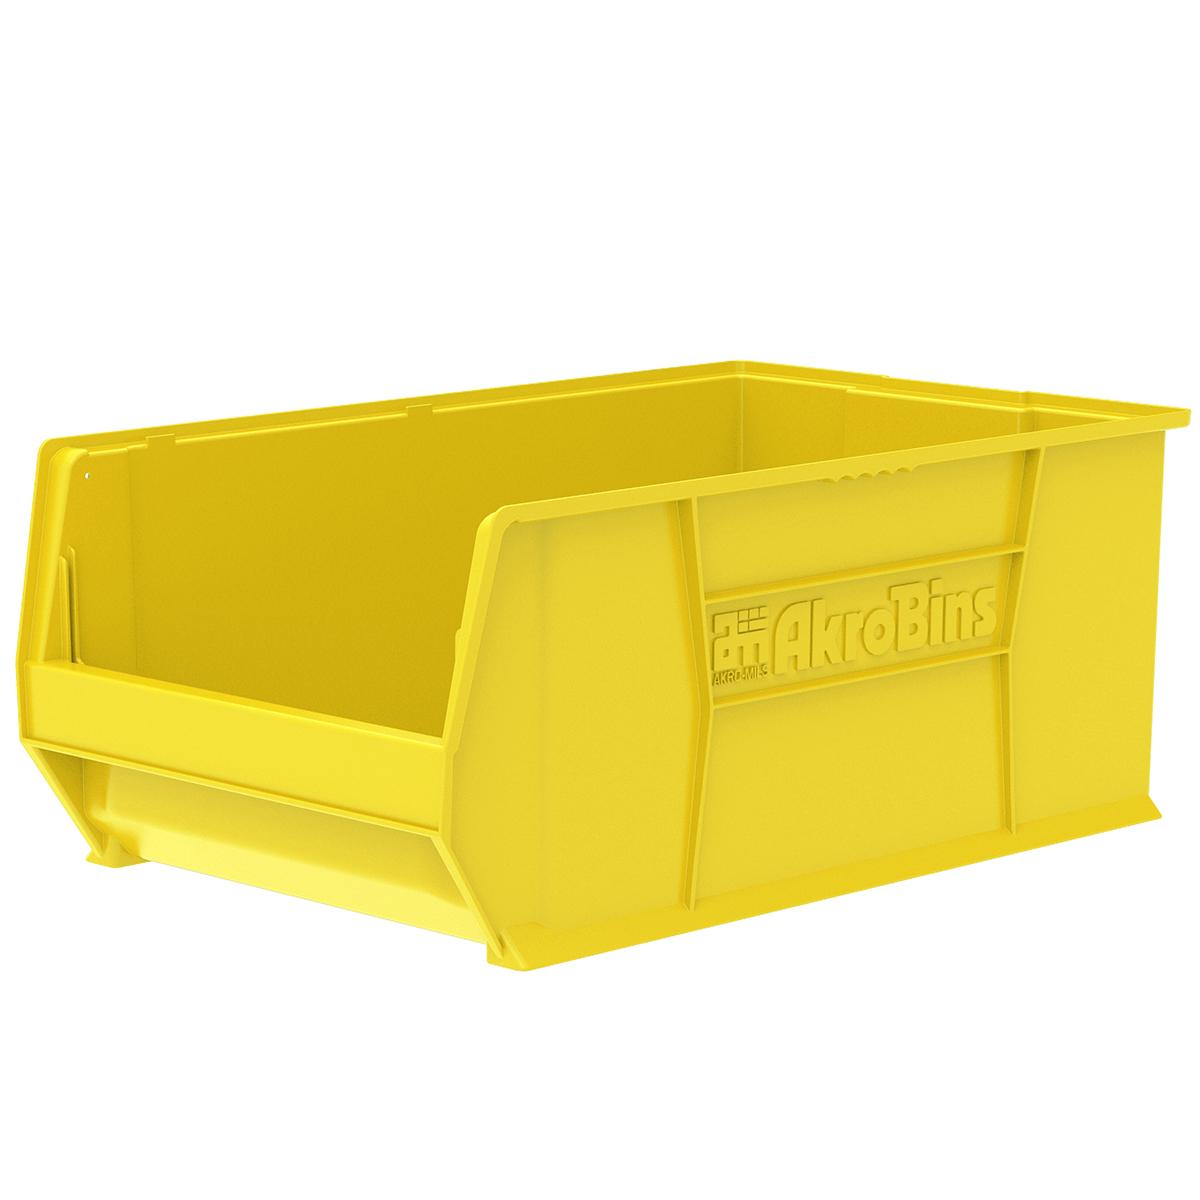 Akrobin Super-Size Length Divider for 30290 18 Case